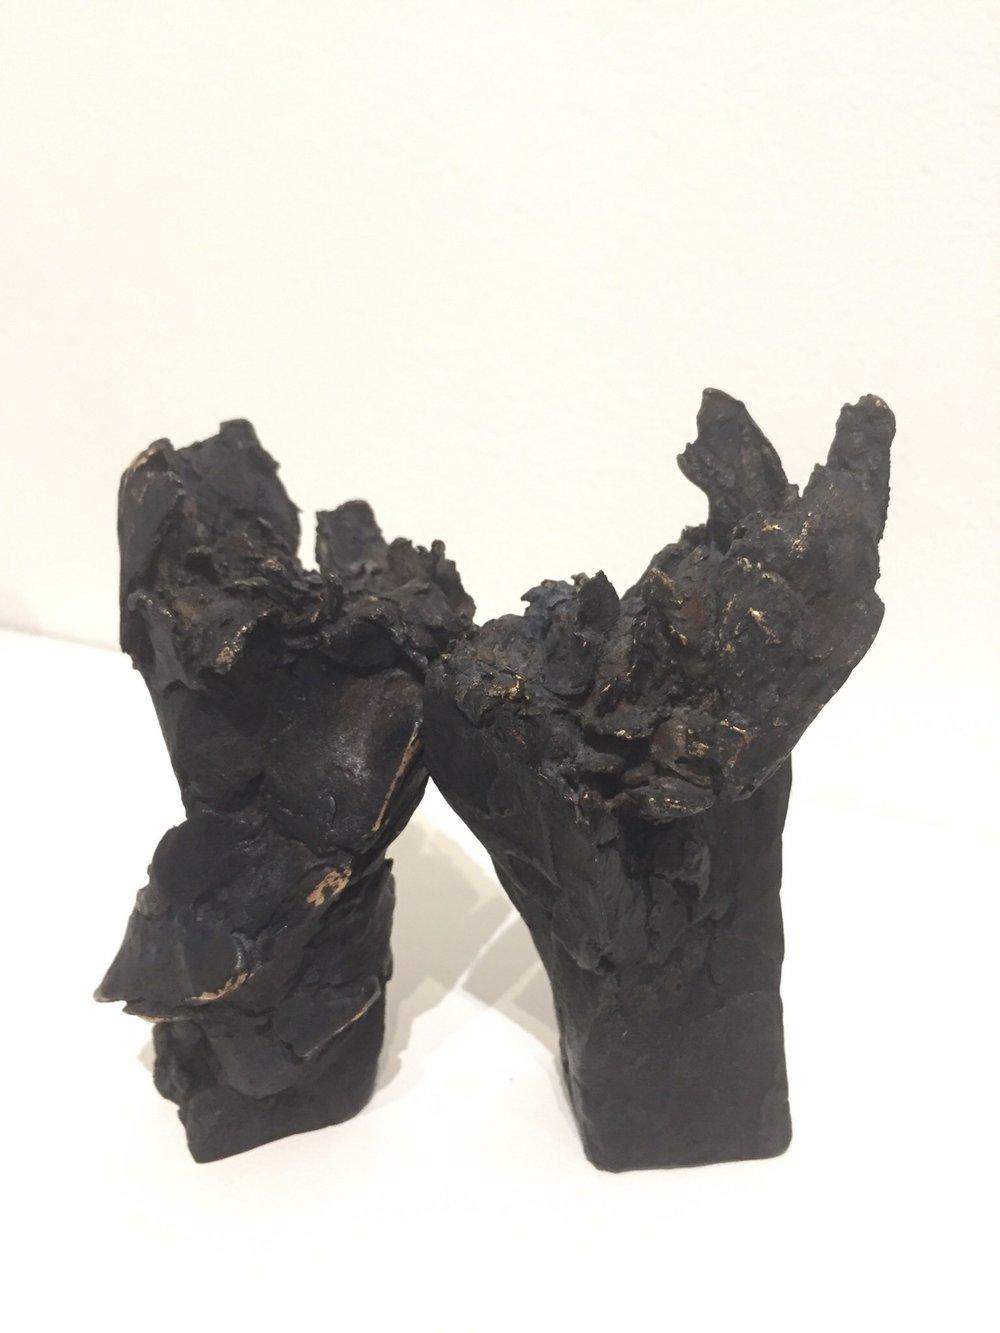 Bosca Briste II, cast bronze, 1/3